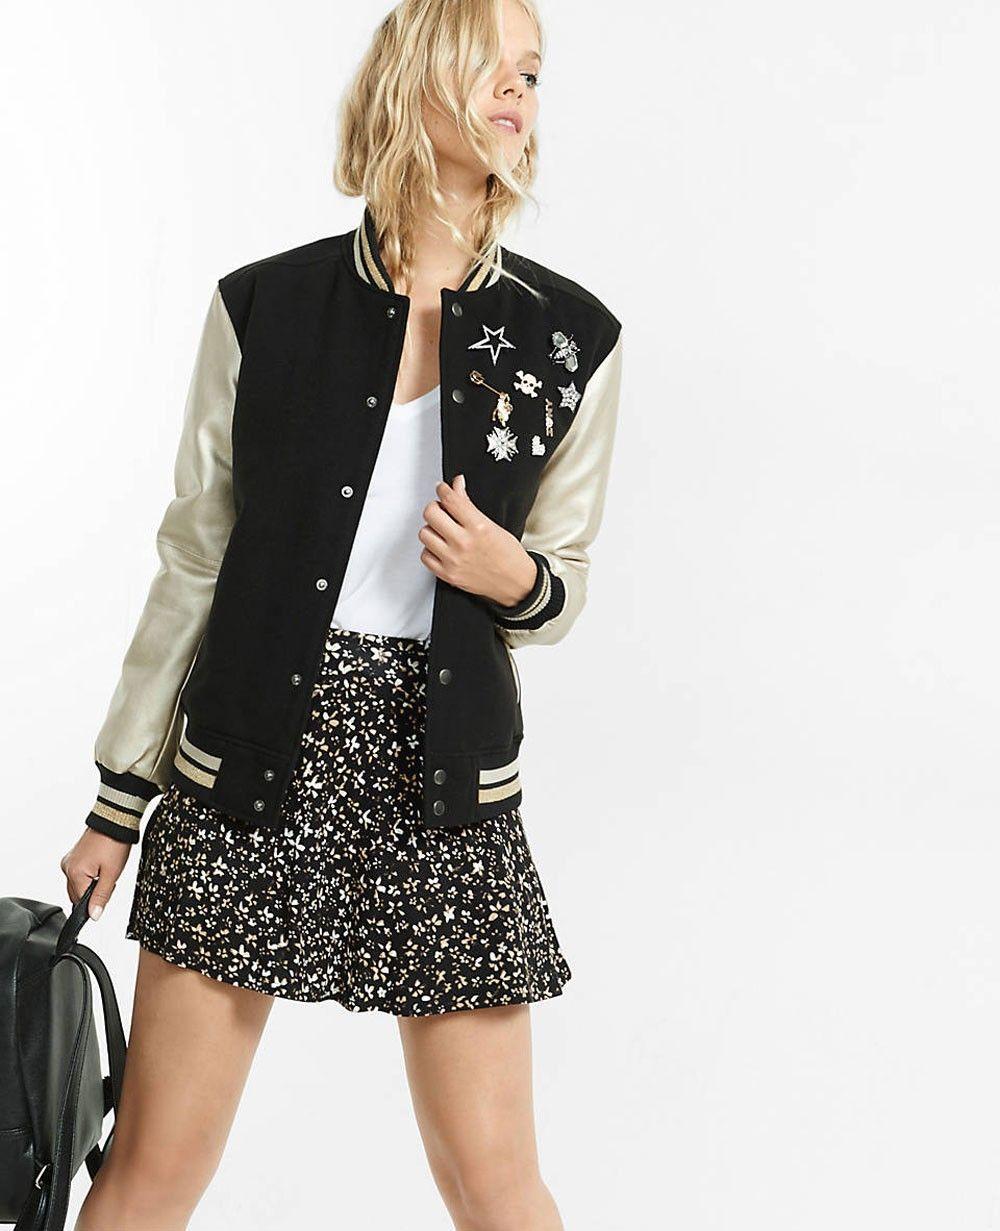 http://www.quickapparels.com/pin-embellished-metallic-long-sleeve-wool-varsity-jacket.html